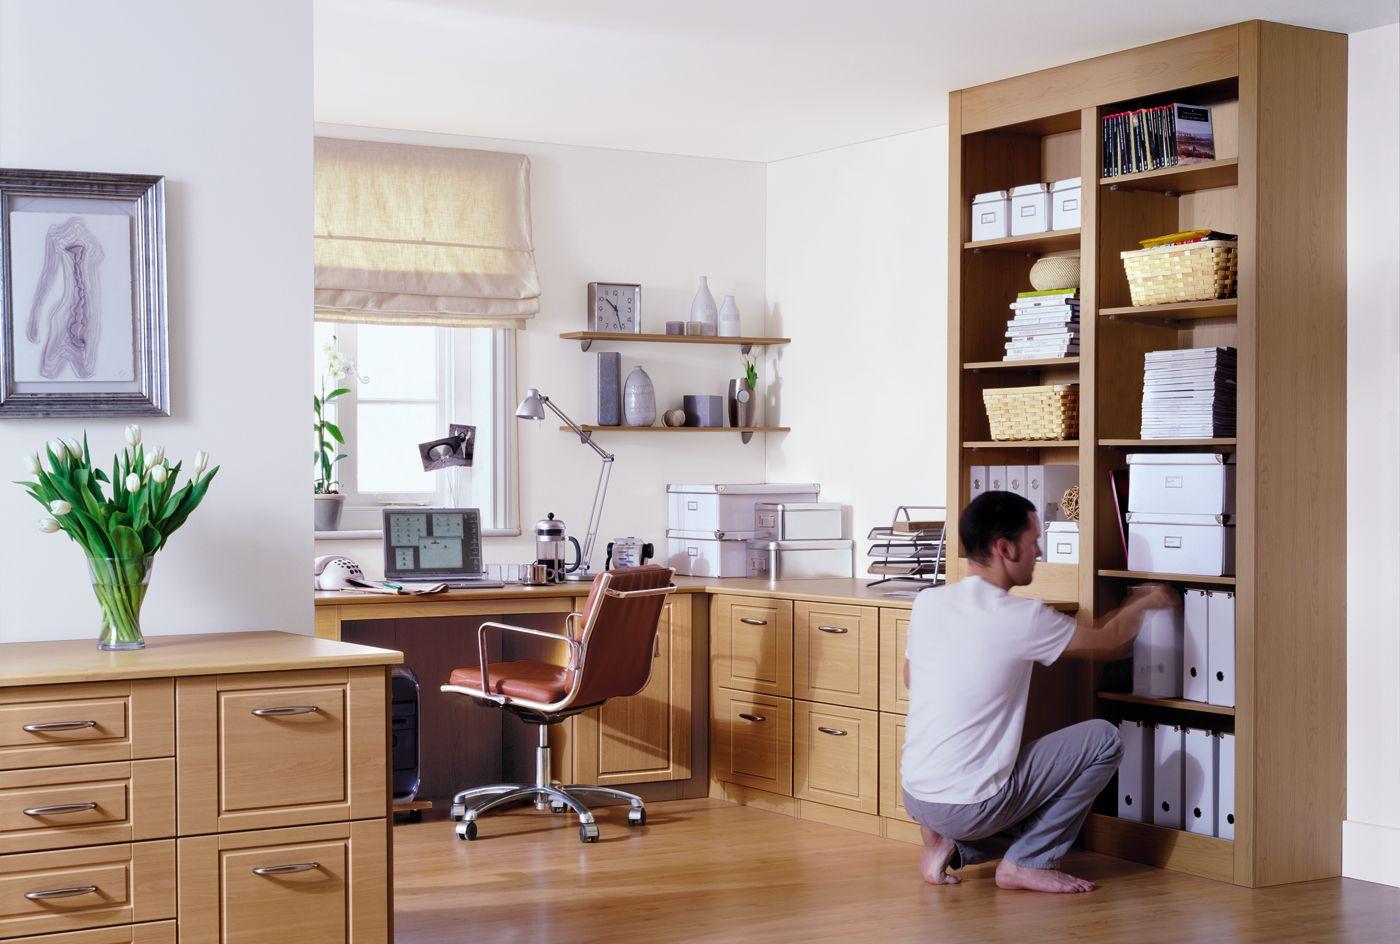 Büro Möbel Eiche Büro Möbel Online   BüroMöbel   Pinterest   Büro ...